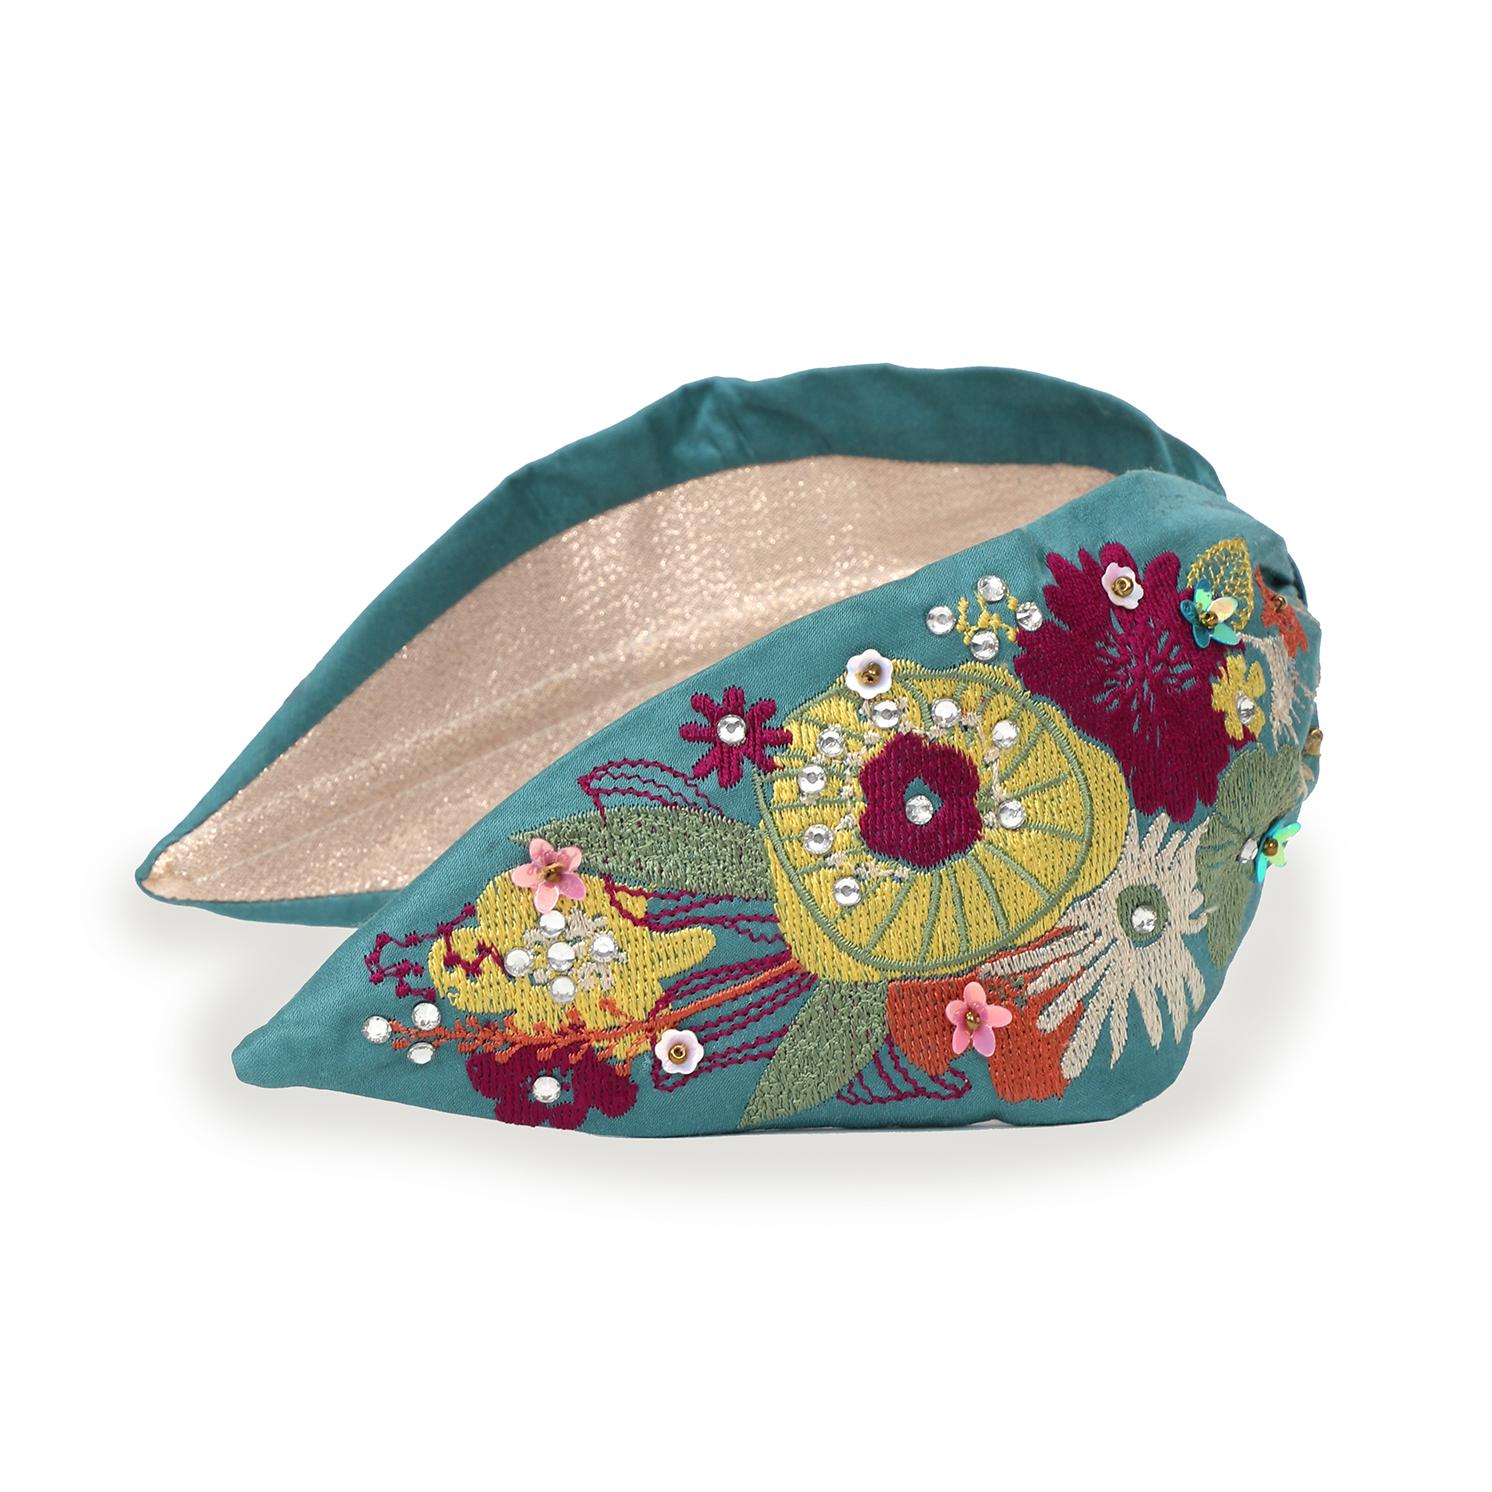 Powder – Turquoise Blue Floral Headband with Powder Presentation Gift Bag